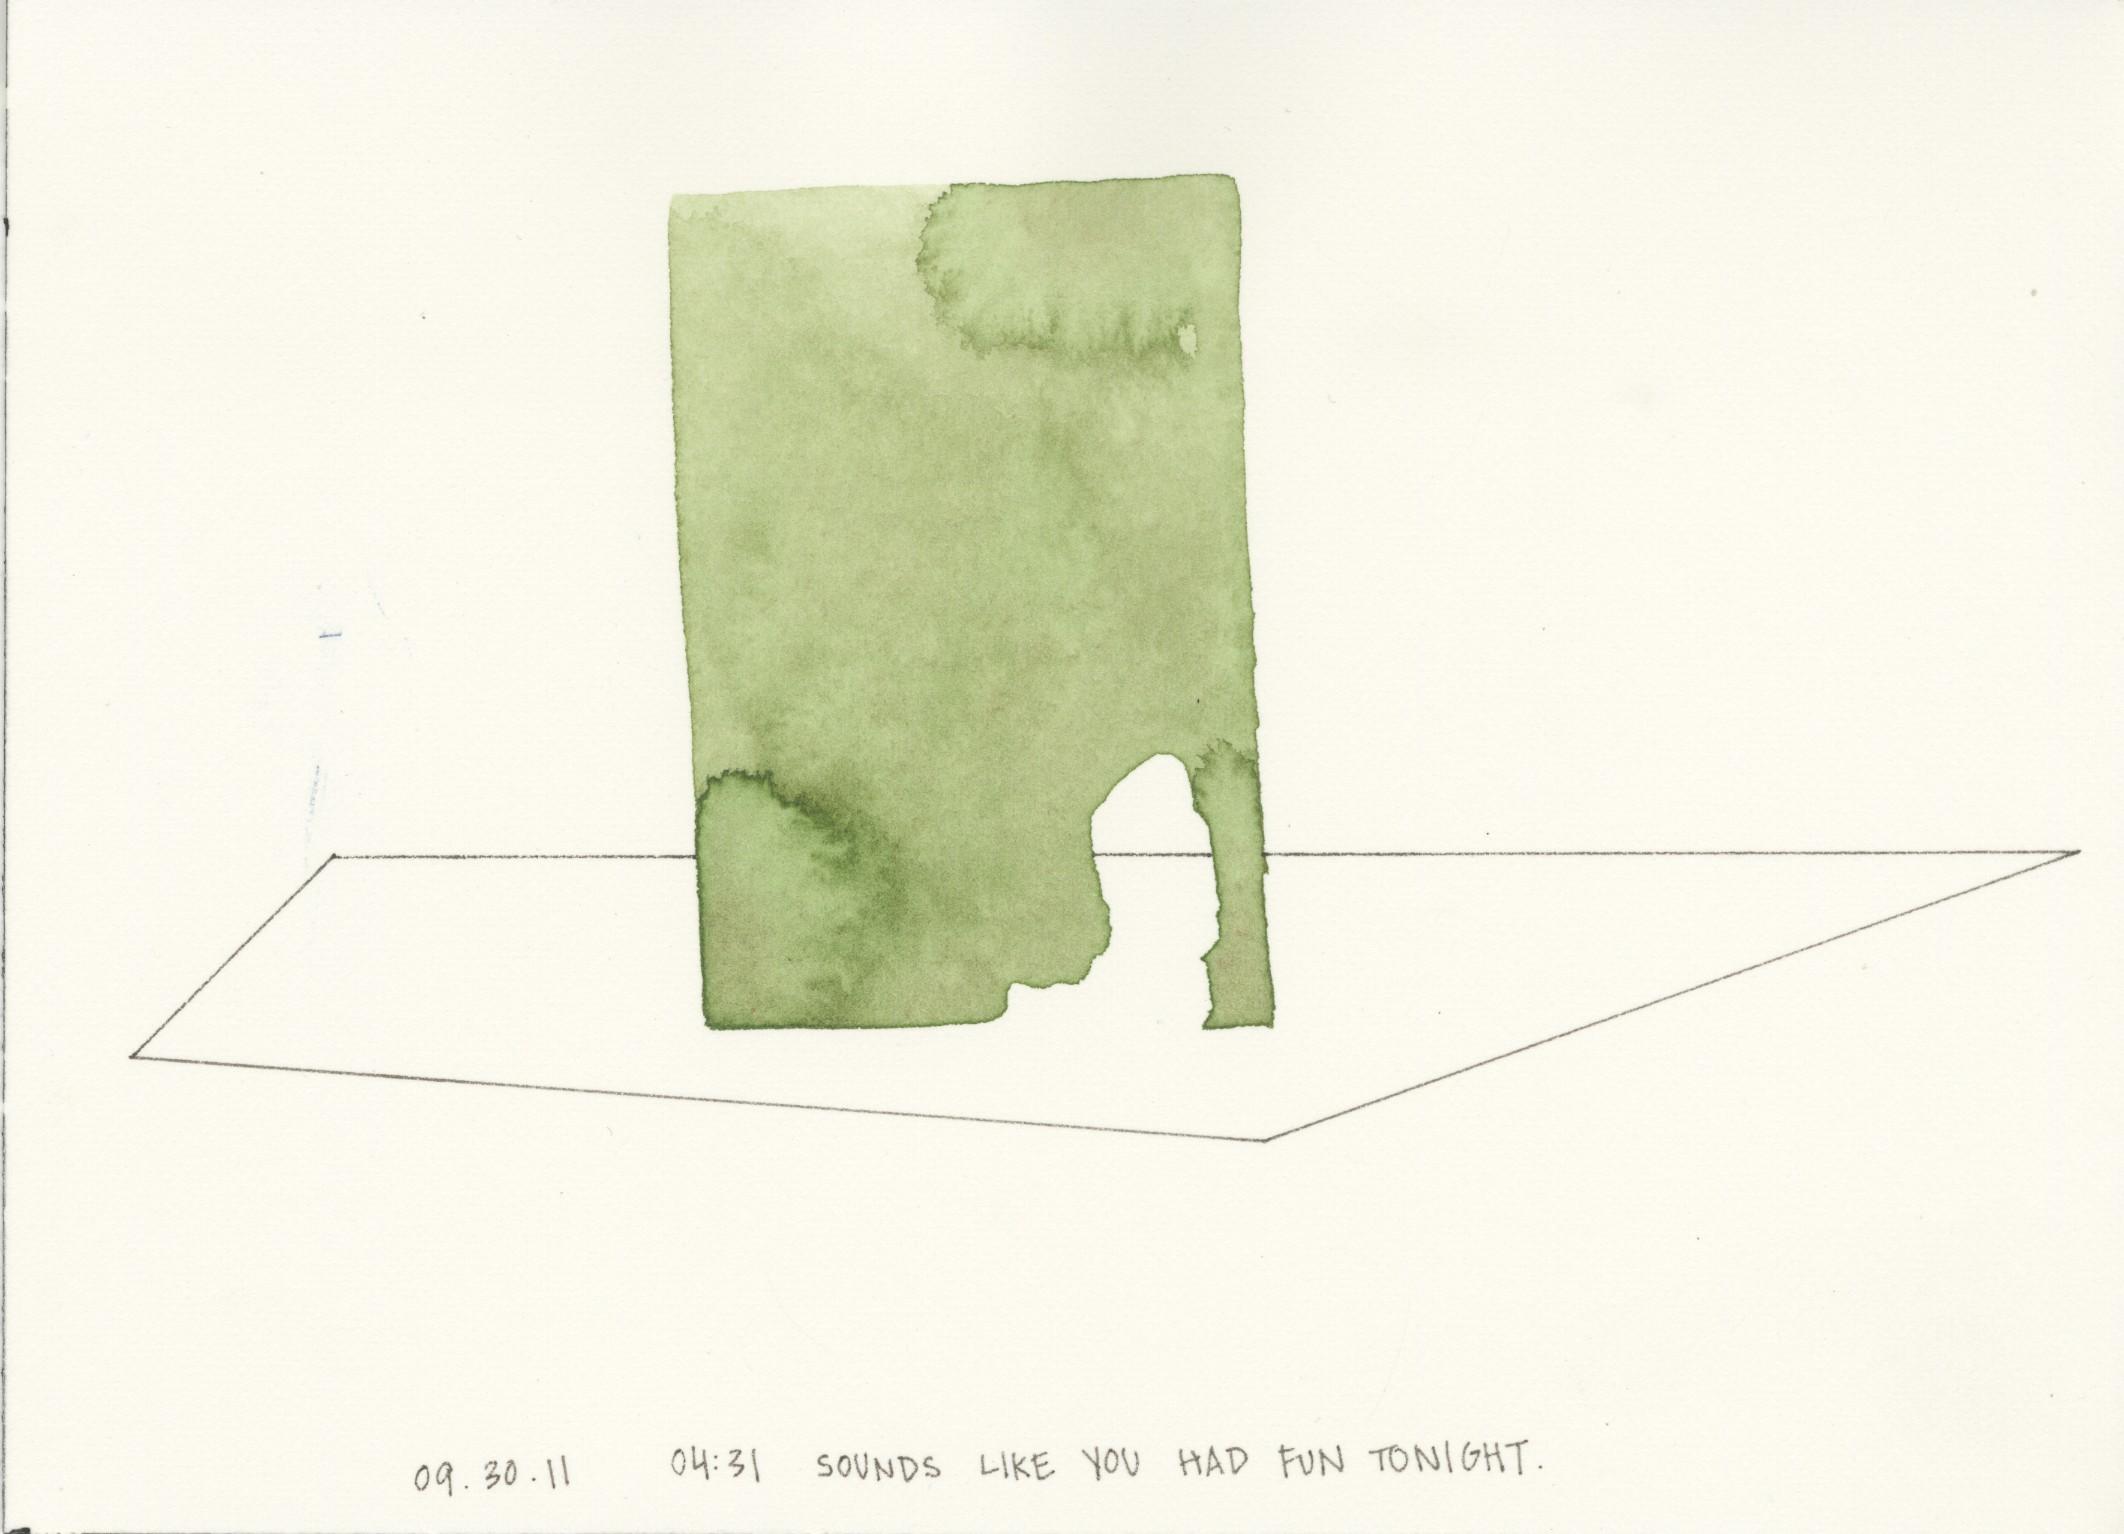 2011-10-28 drawing 01.jpg